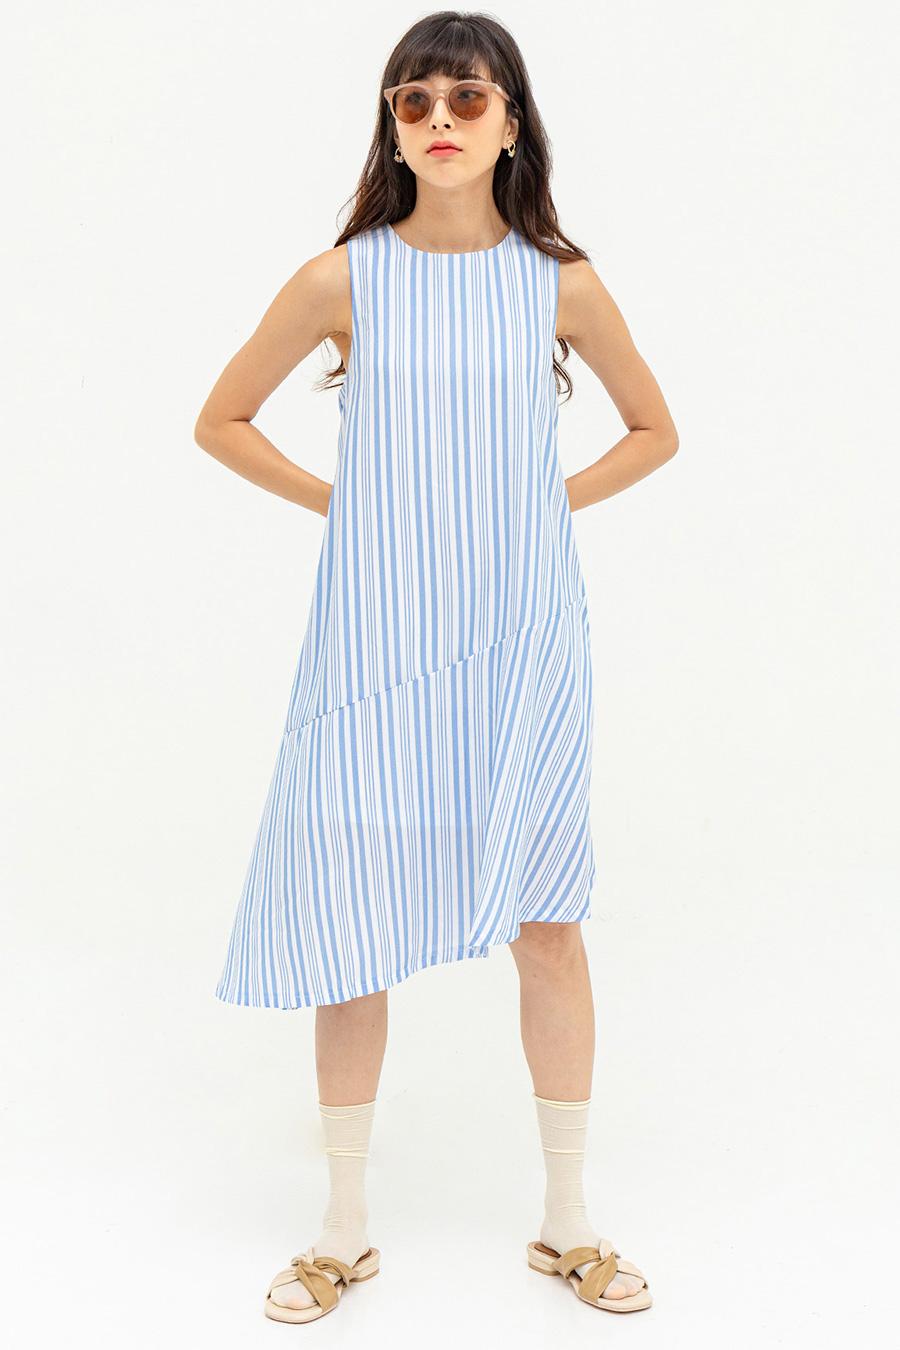 FIUGGI DRESS - MILK JUG STRIPE [BY MODPARADE]